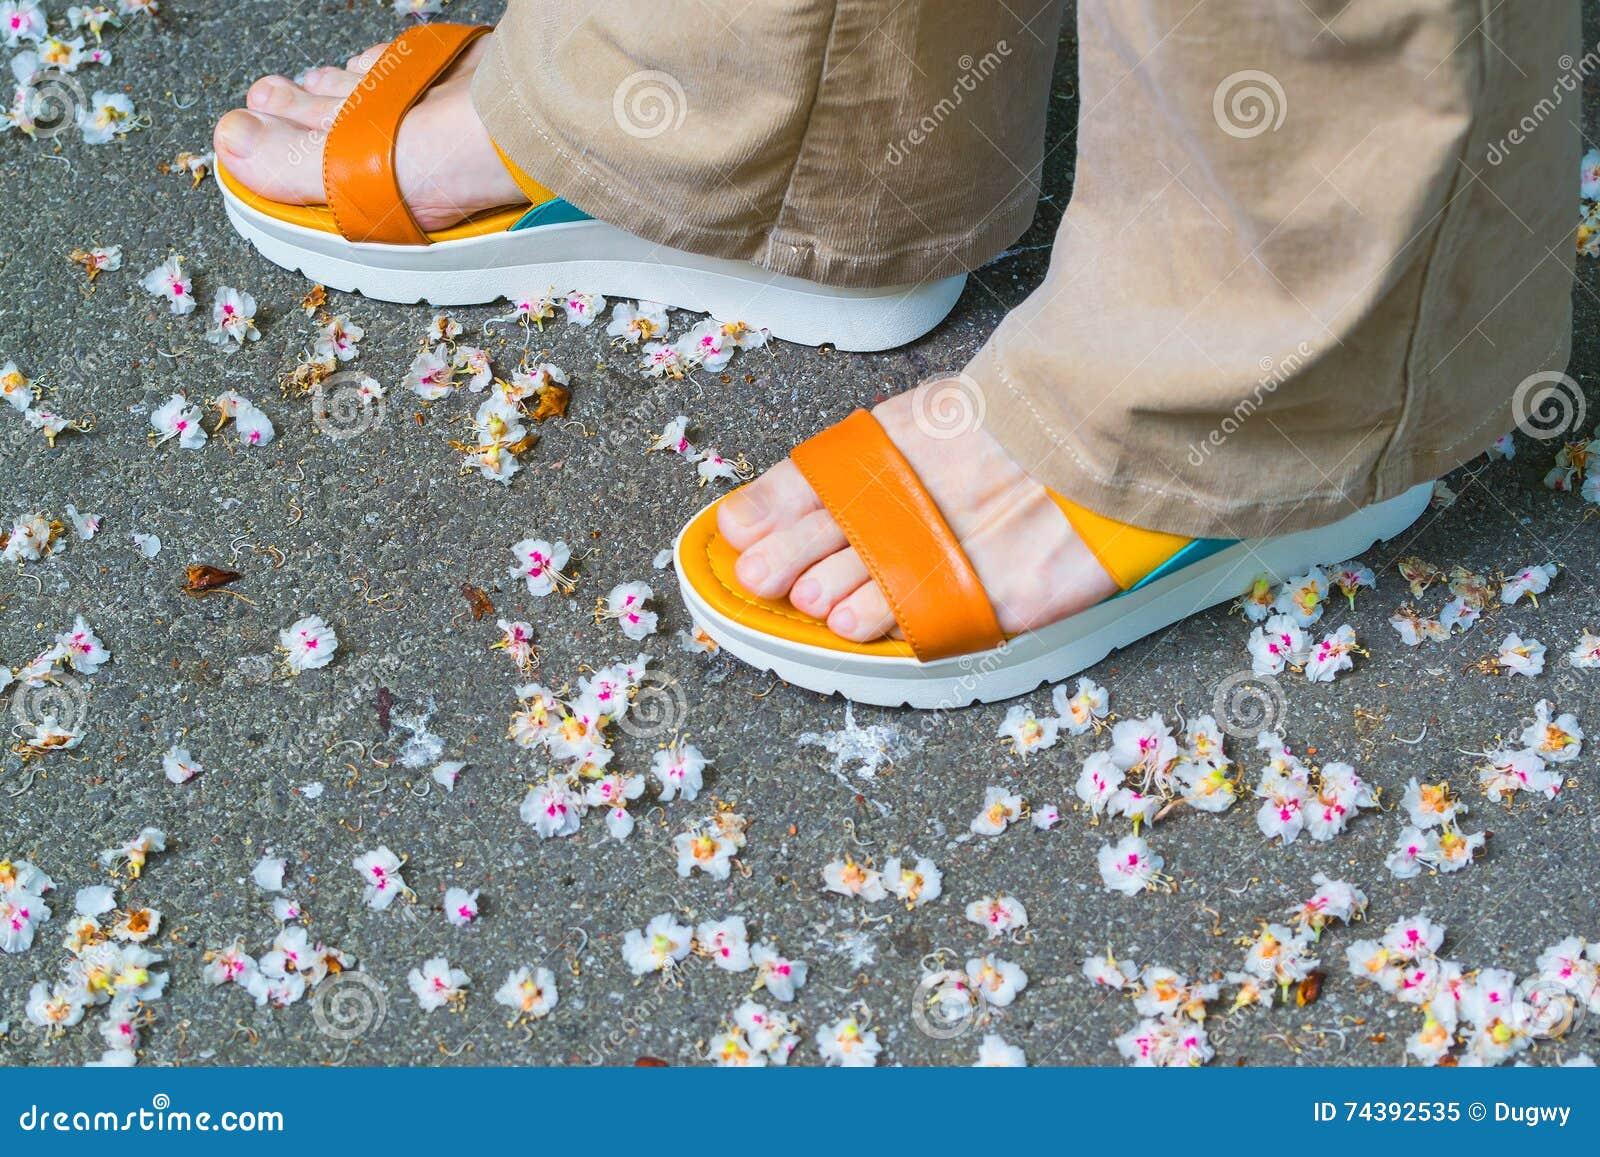 Female feet in sandals